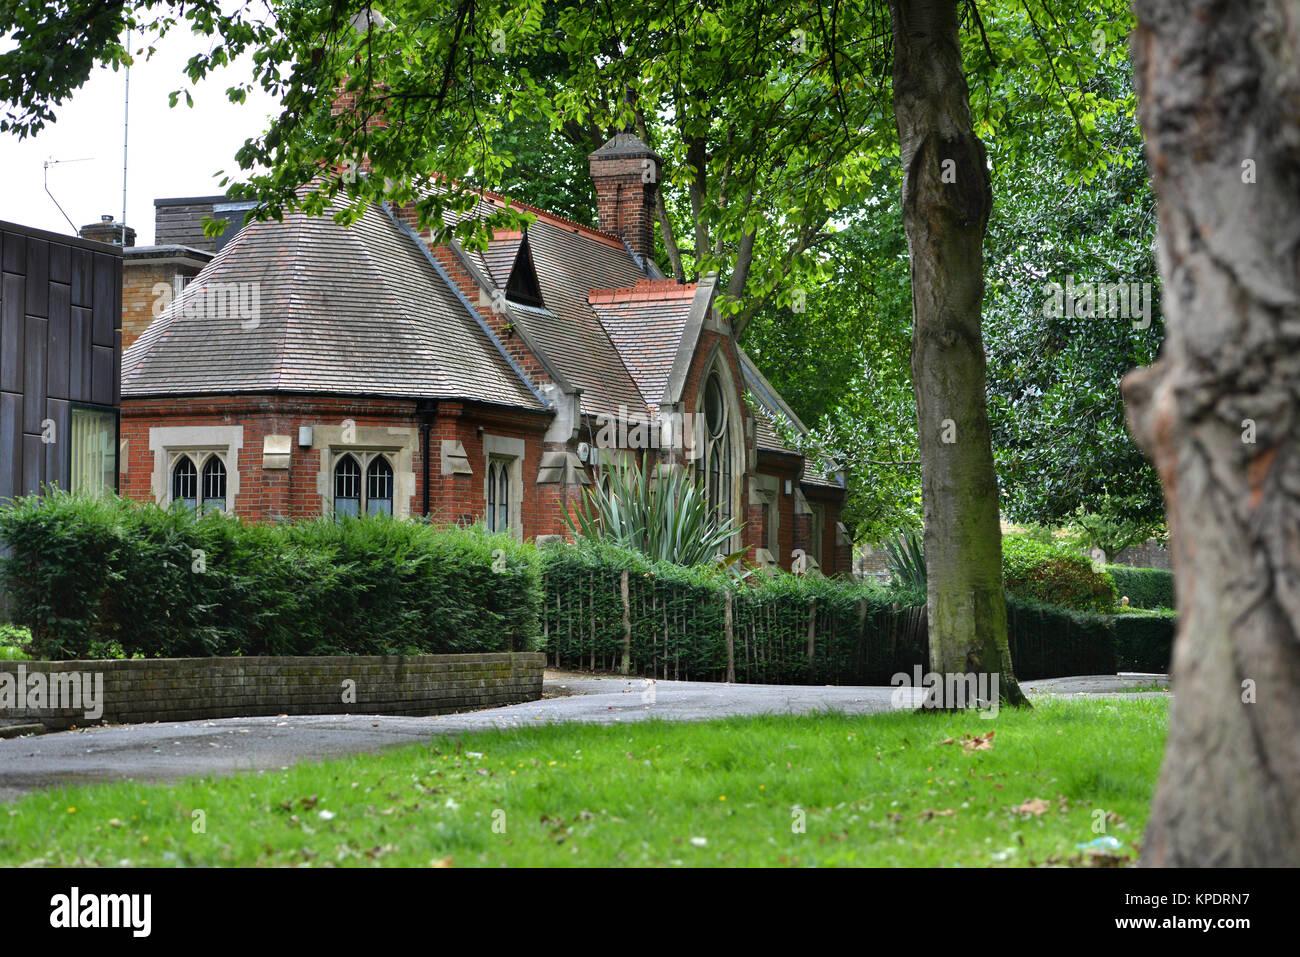 St Pancras Coroner's Court, London - Stock Image